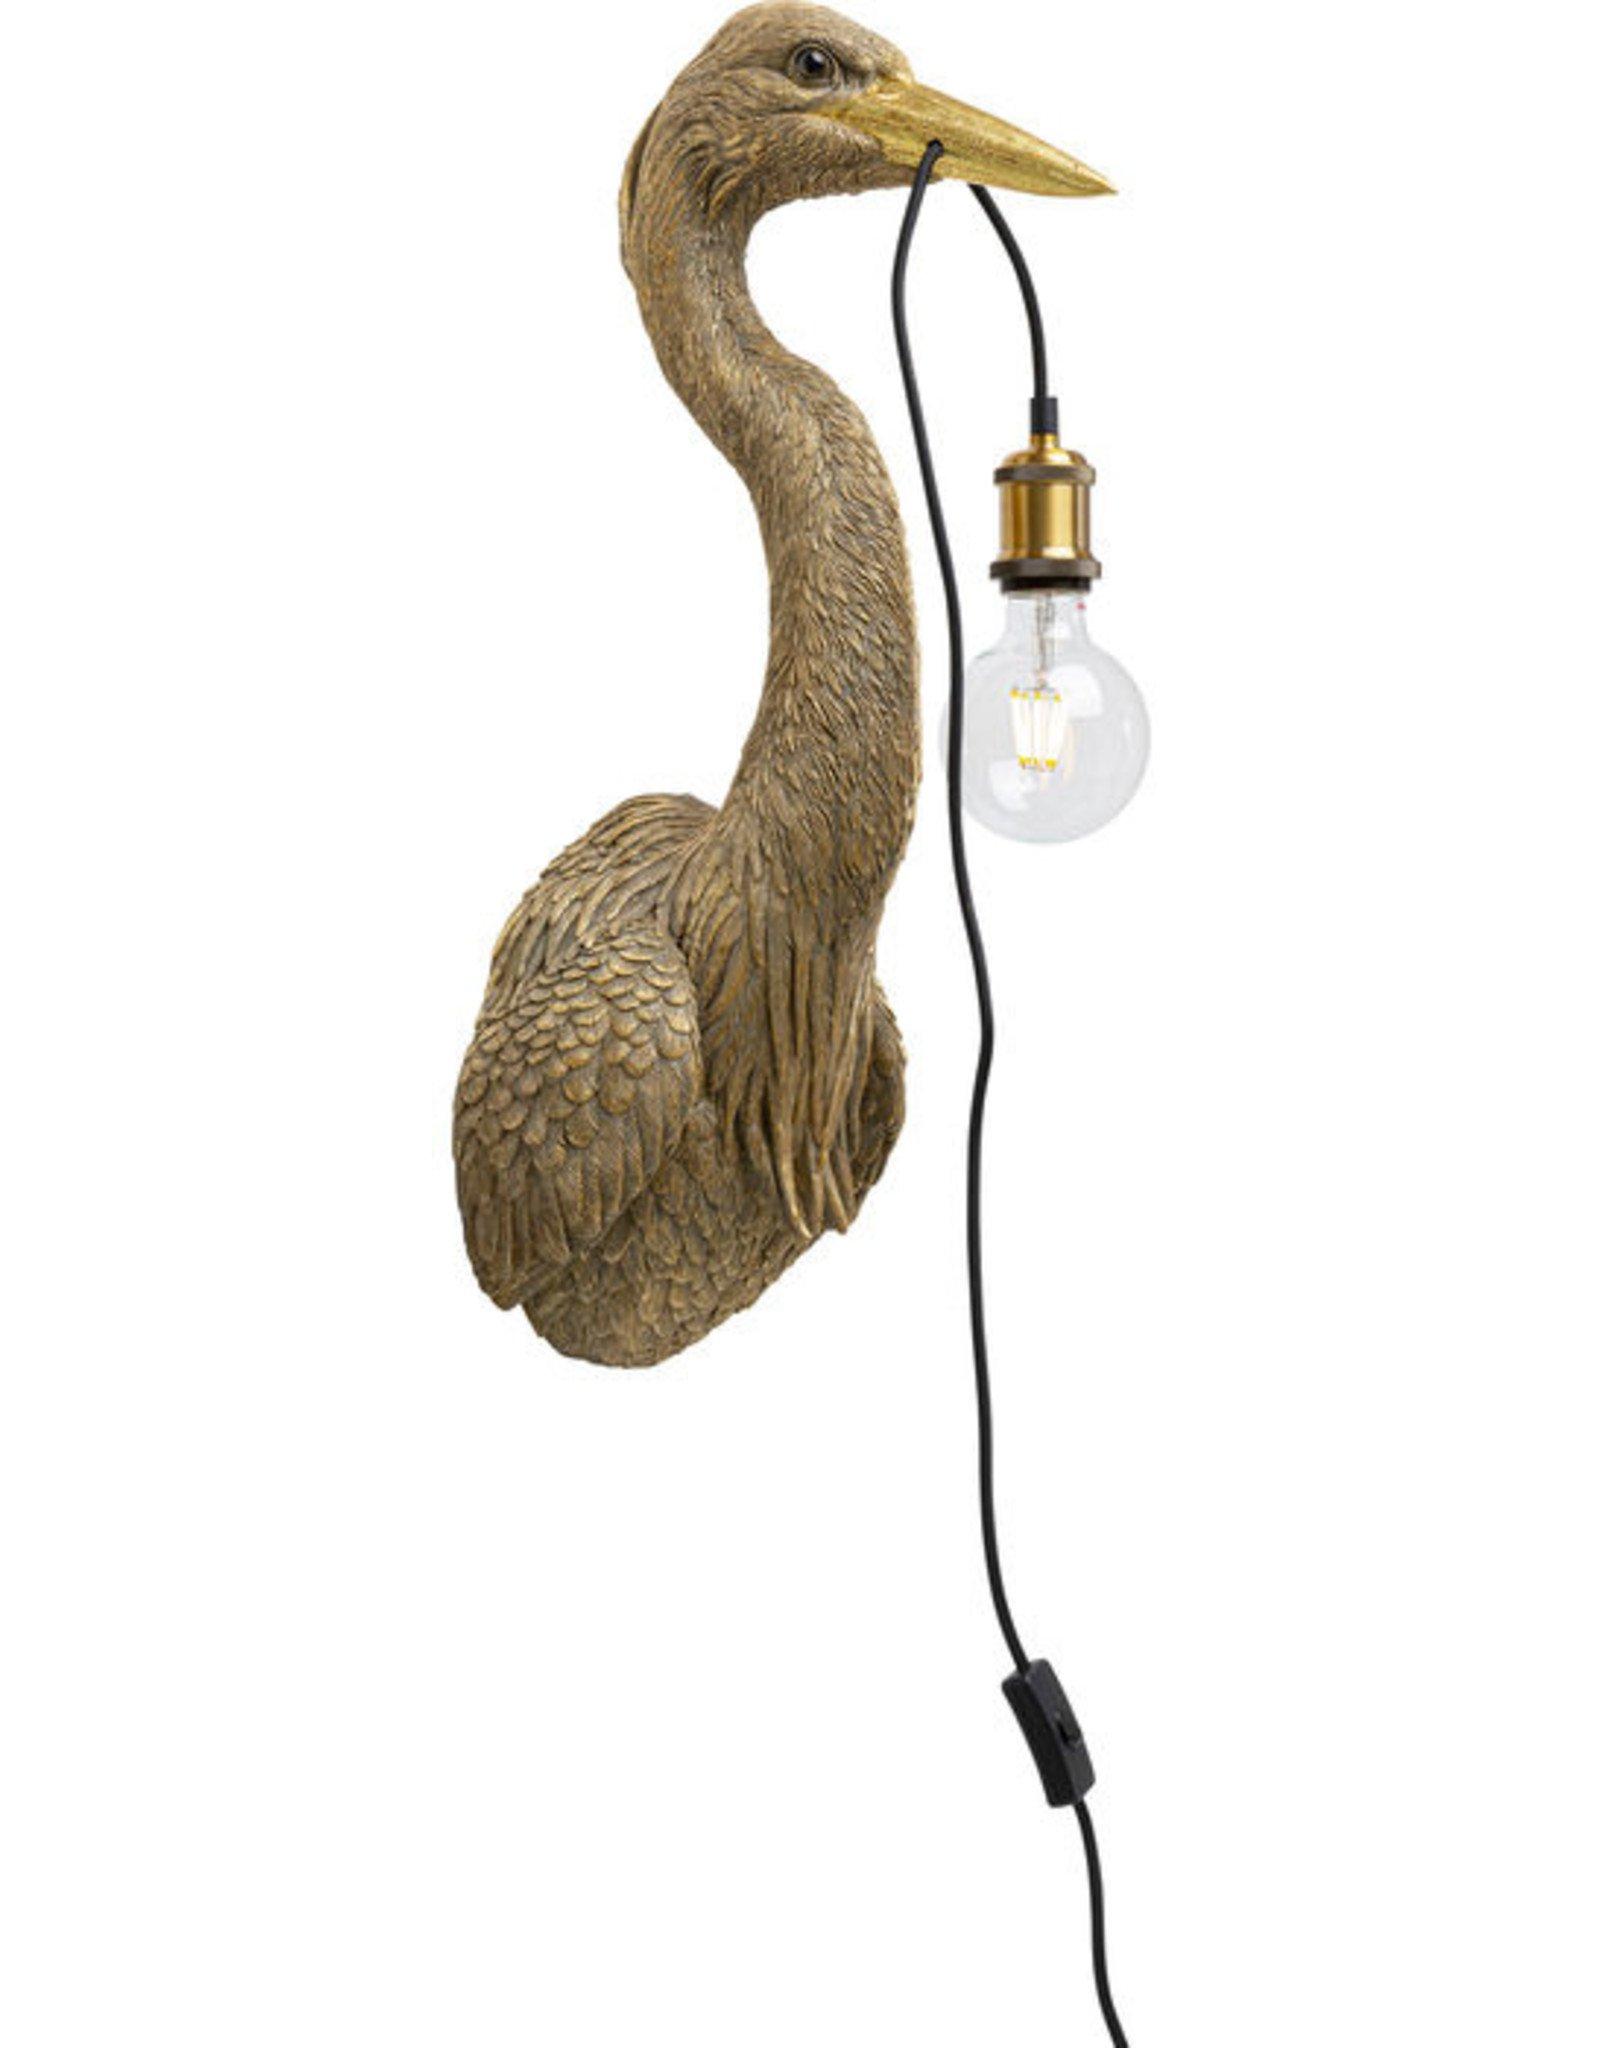 Kare Design Wall lamp animal Heron